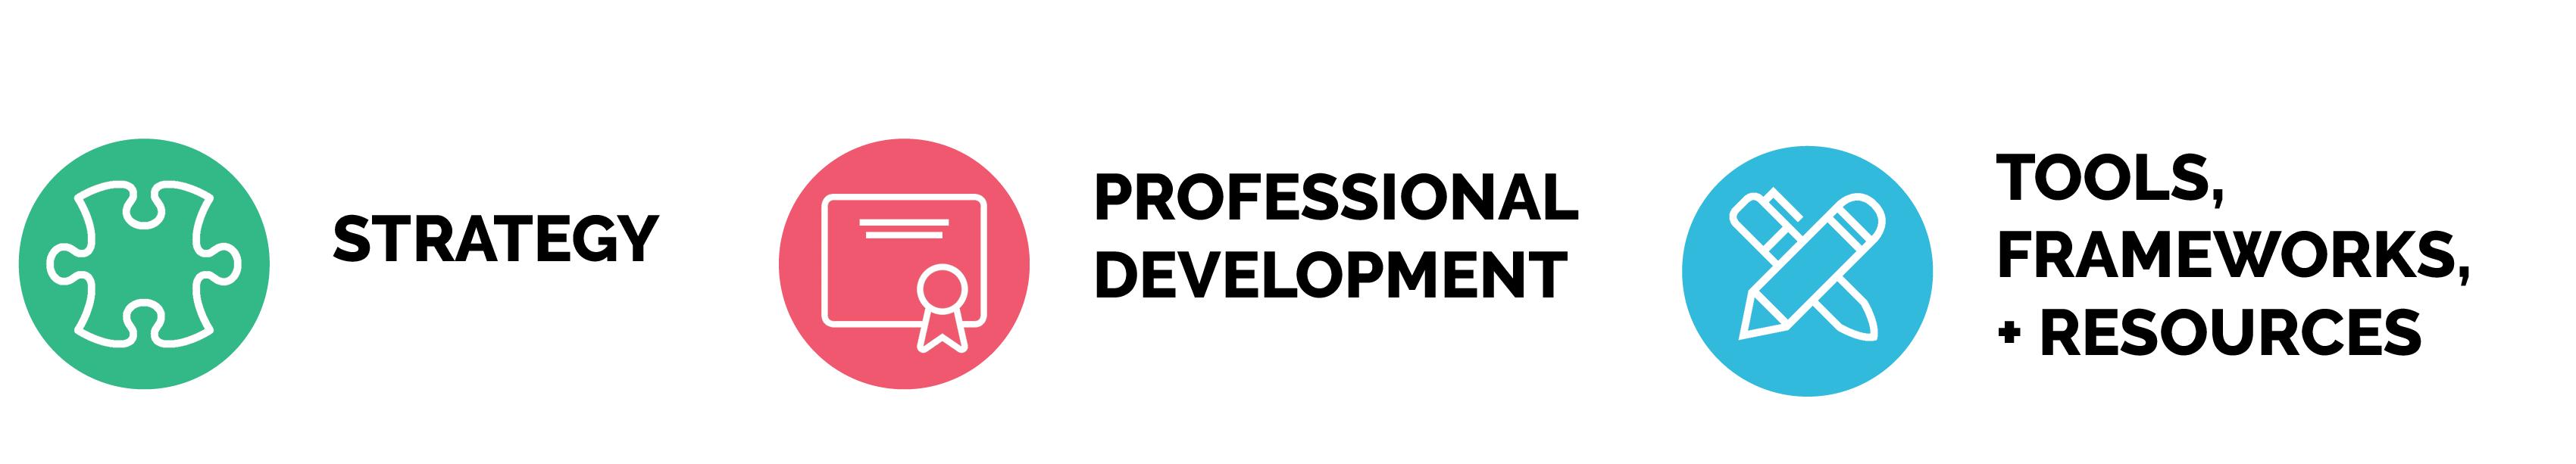 Future Design School - About Us